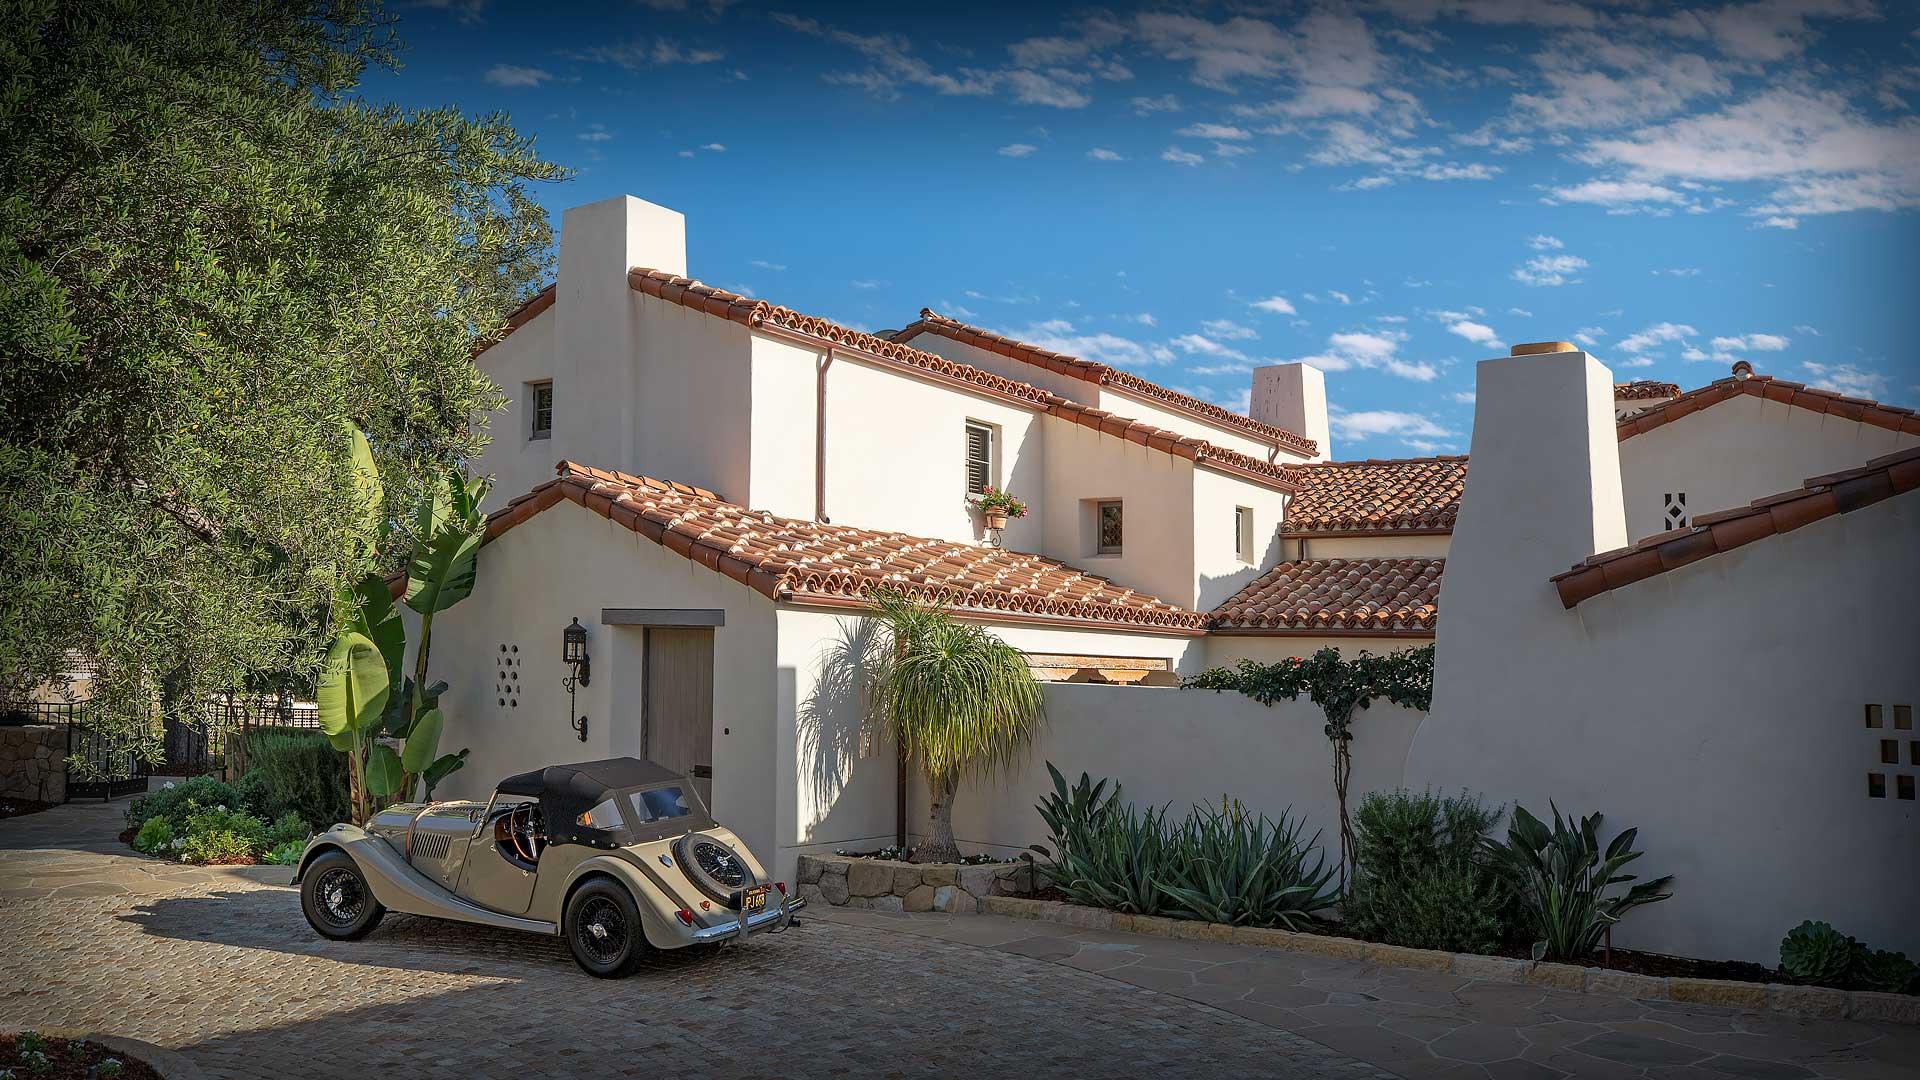 sanborn-residence-1920×1080-02a